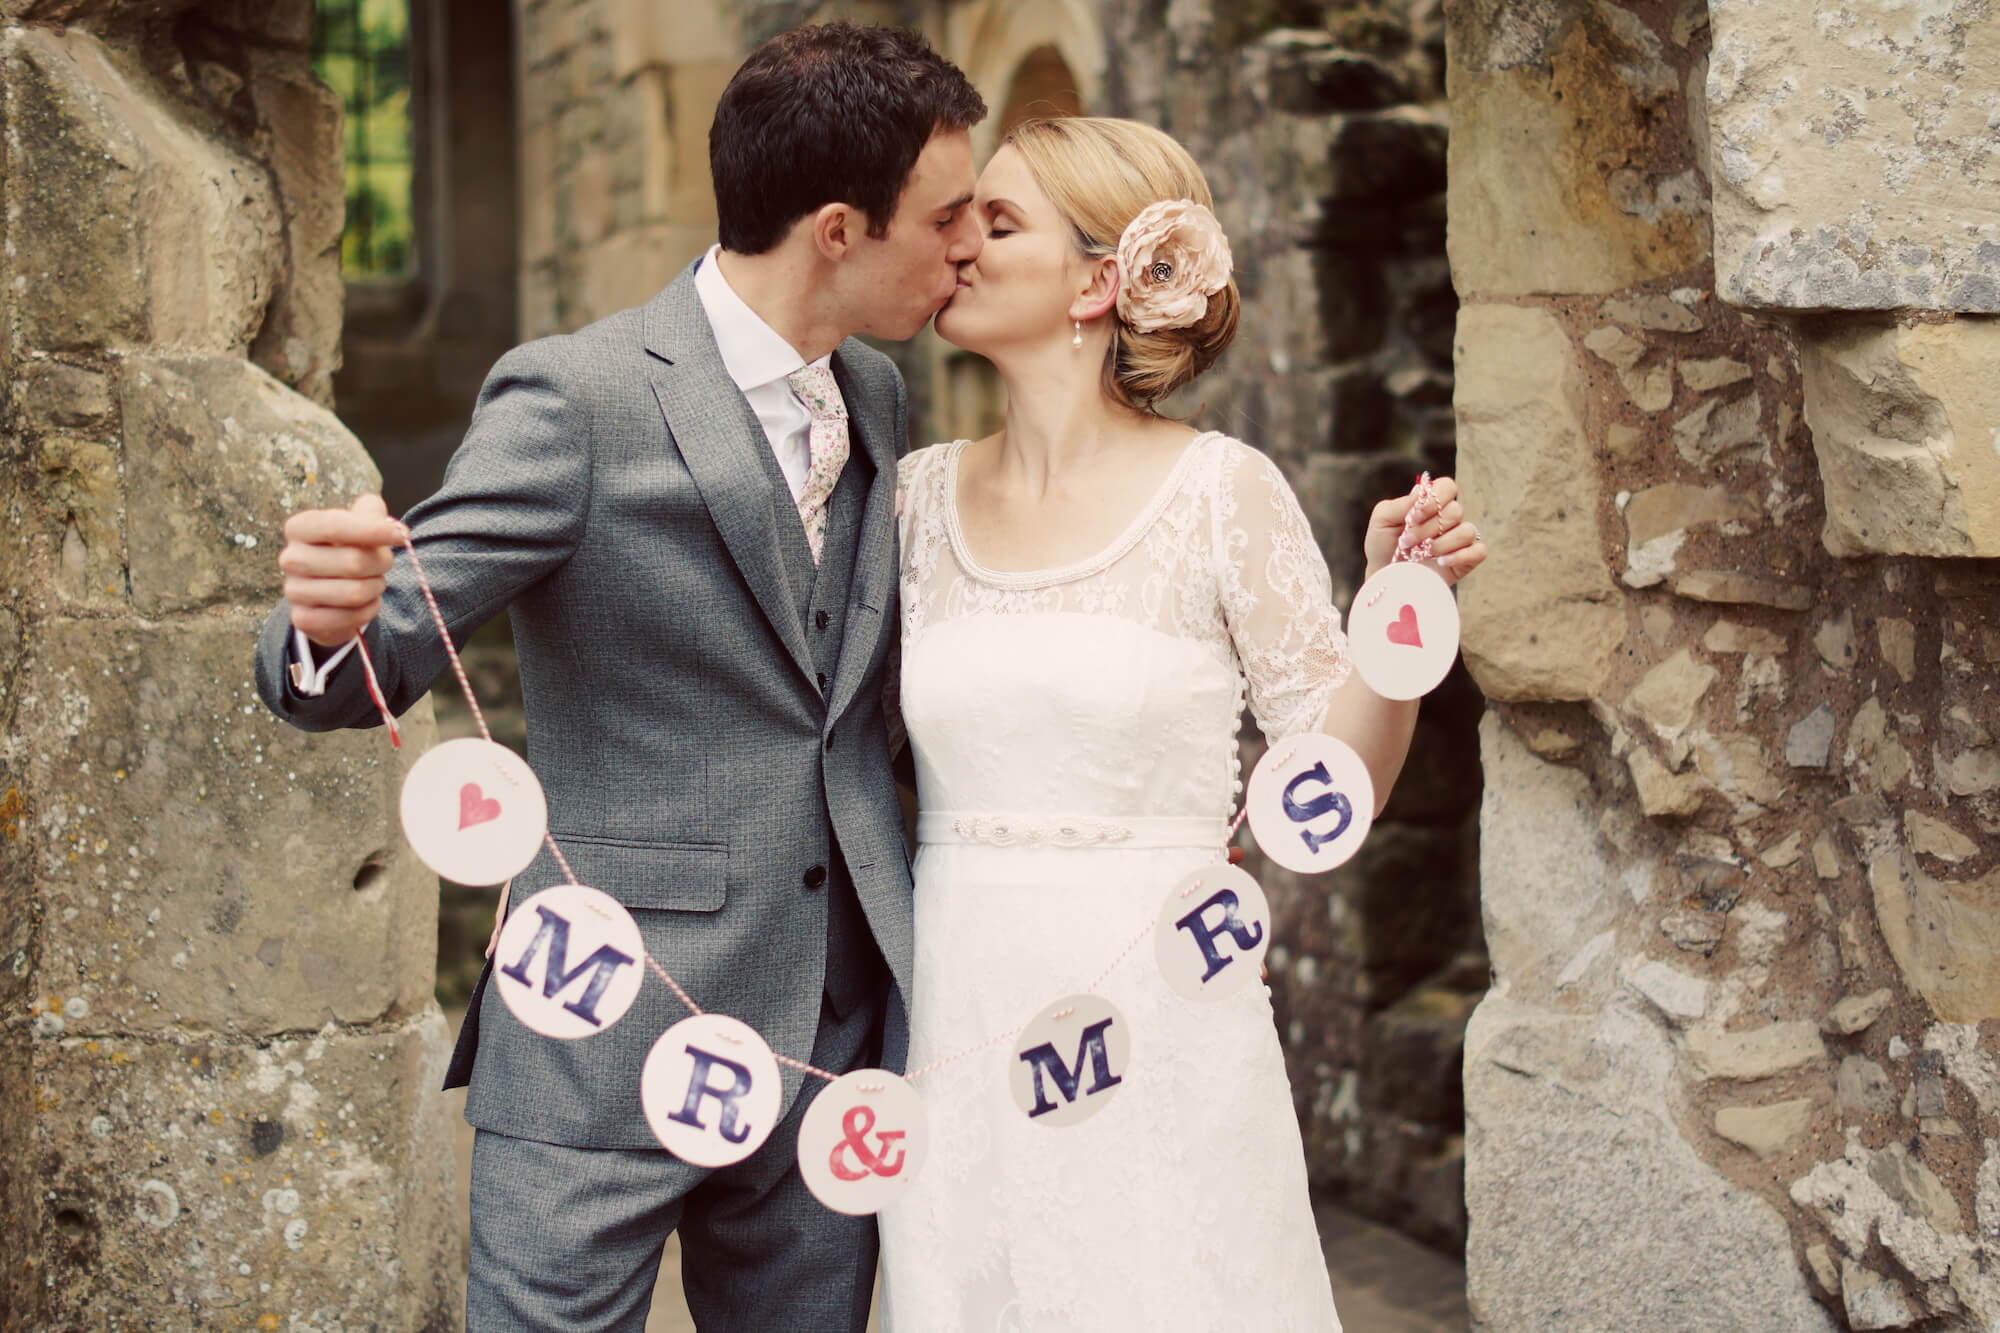 Mr and Mrs Wedding couple